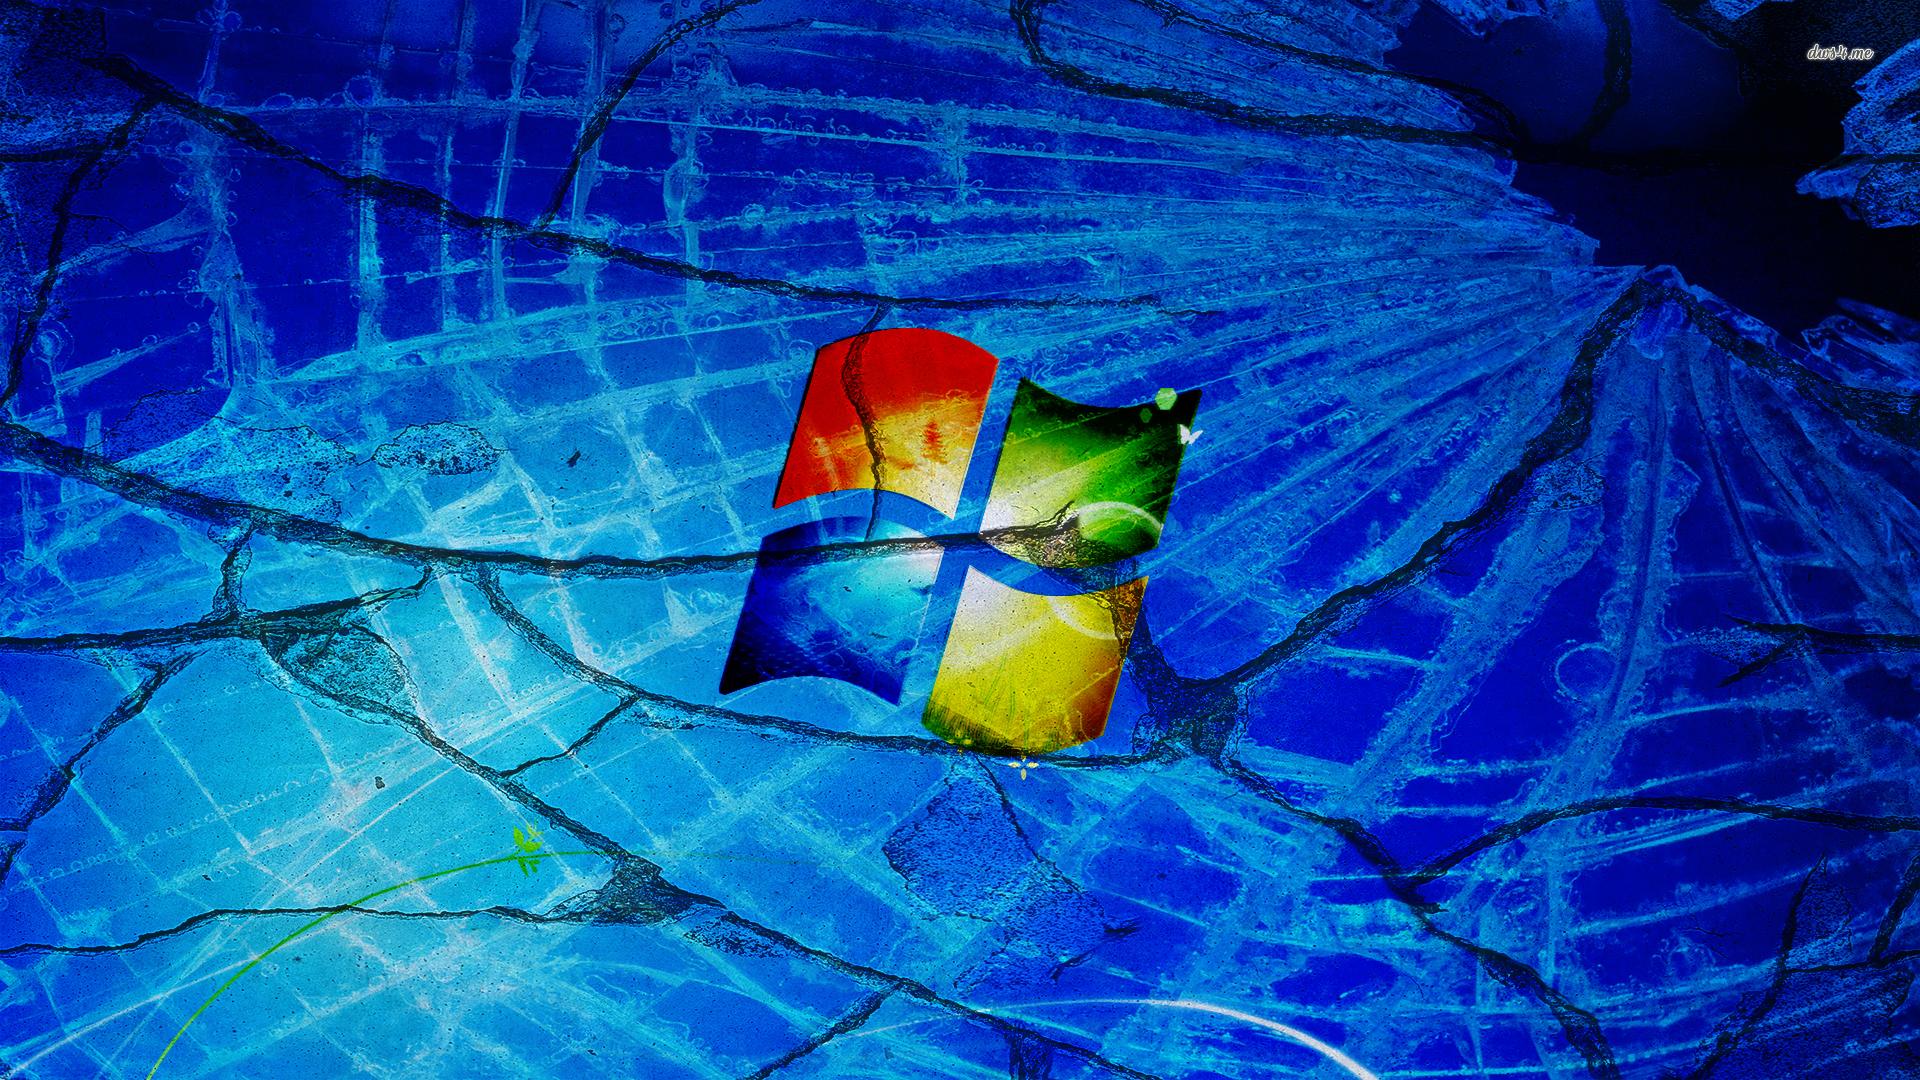 Cracked Windows 7 wallpaper 1280x800 Cracked Windows 7 wallpaper 1920x1080